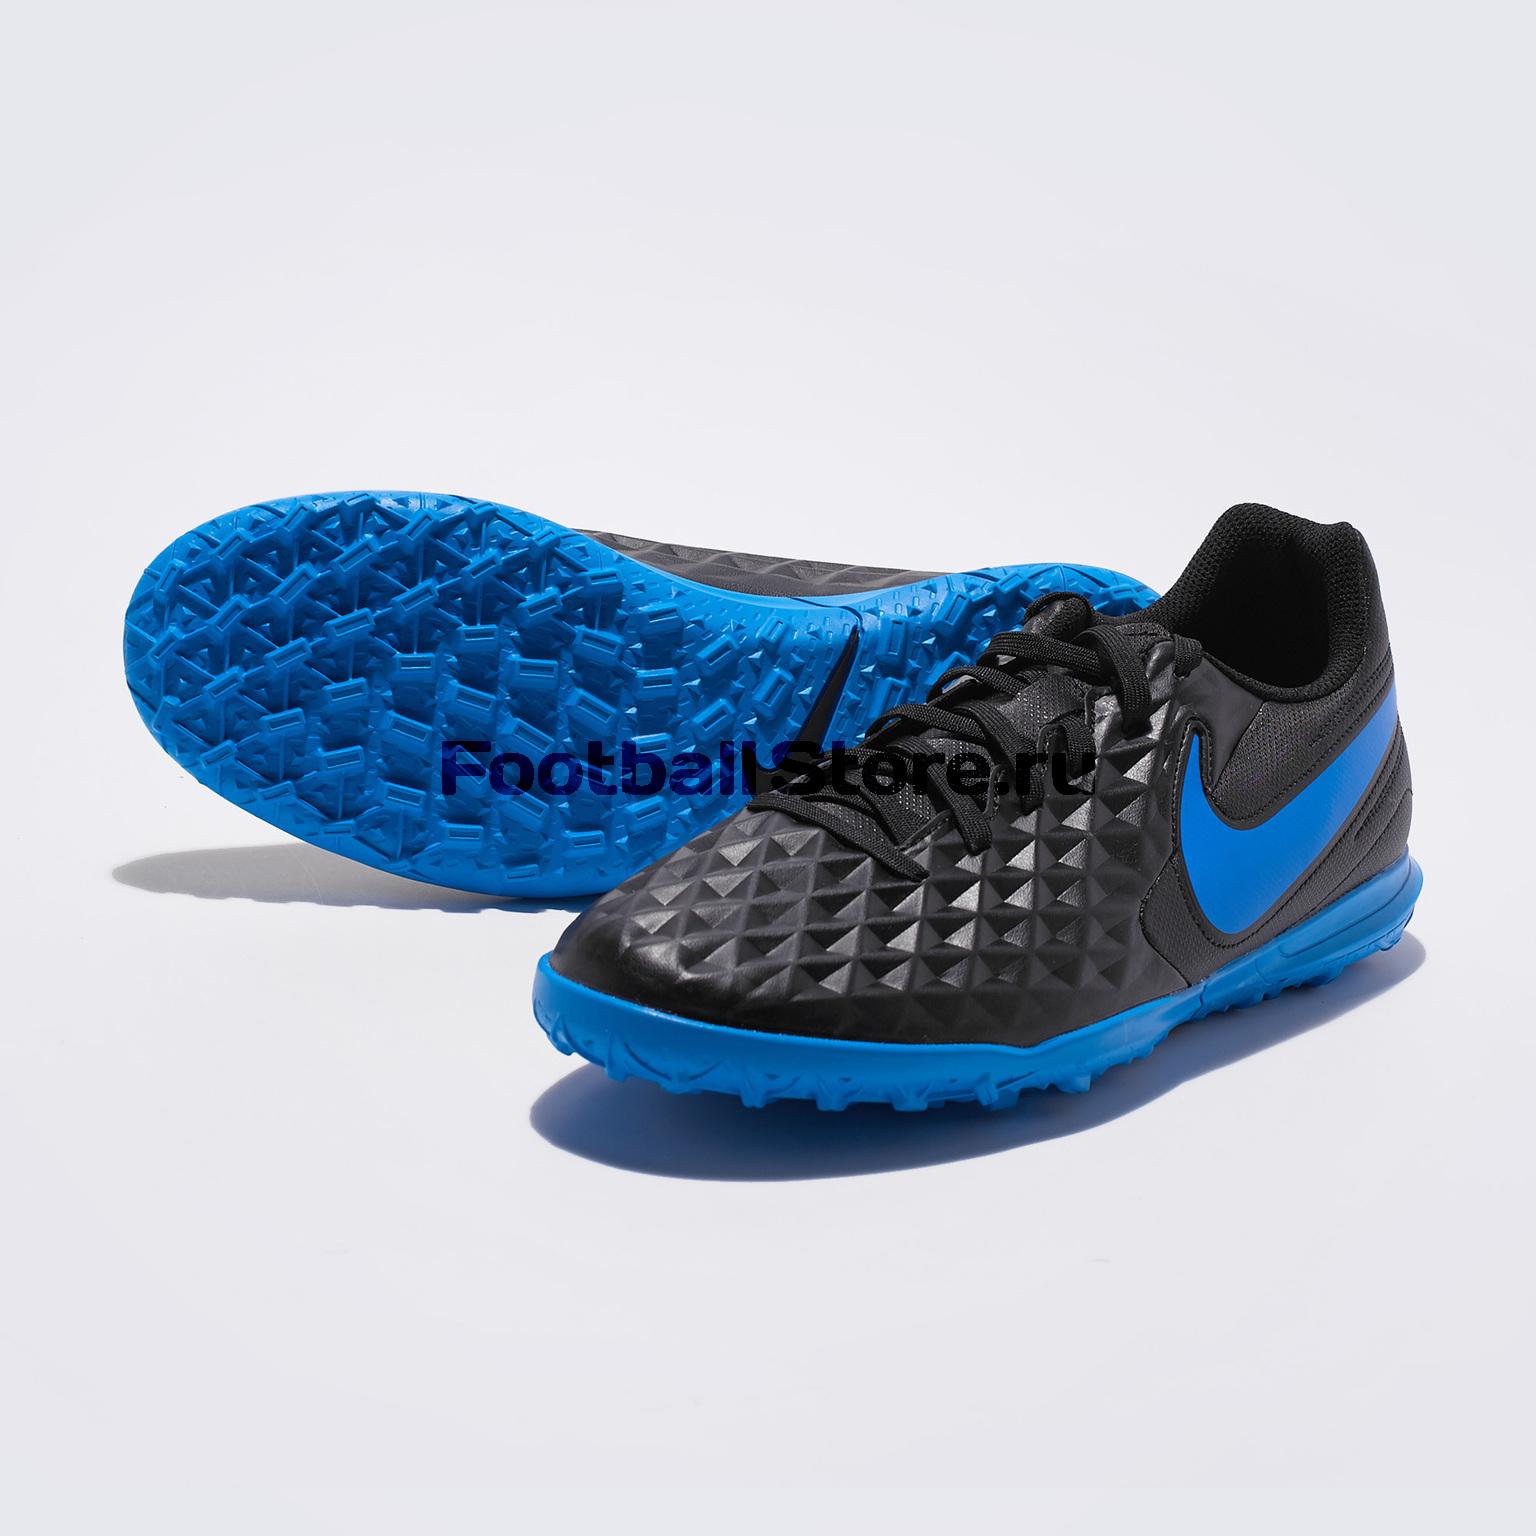 цены на Шиповки Nike Legend 8 Club TF AT6109-004  в интернет-магазинах